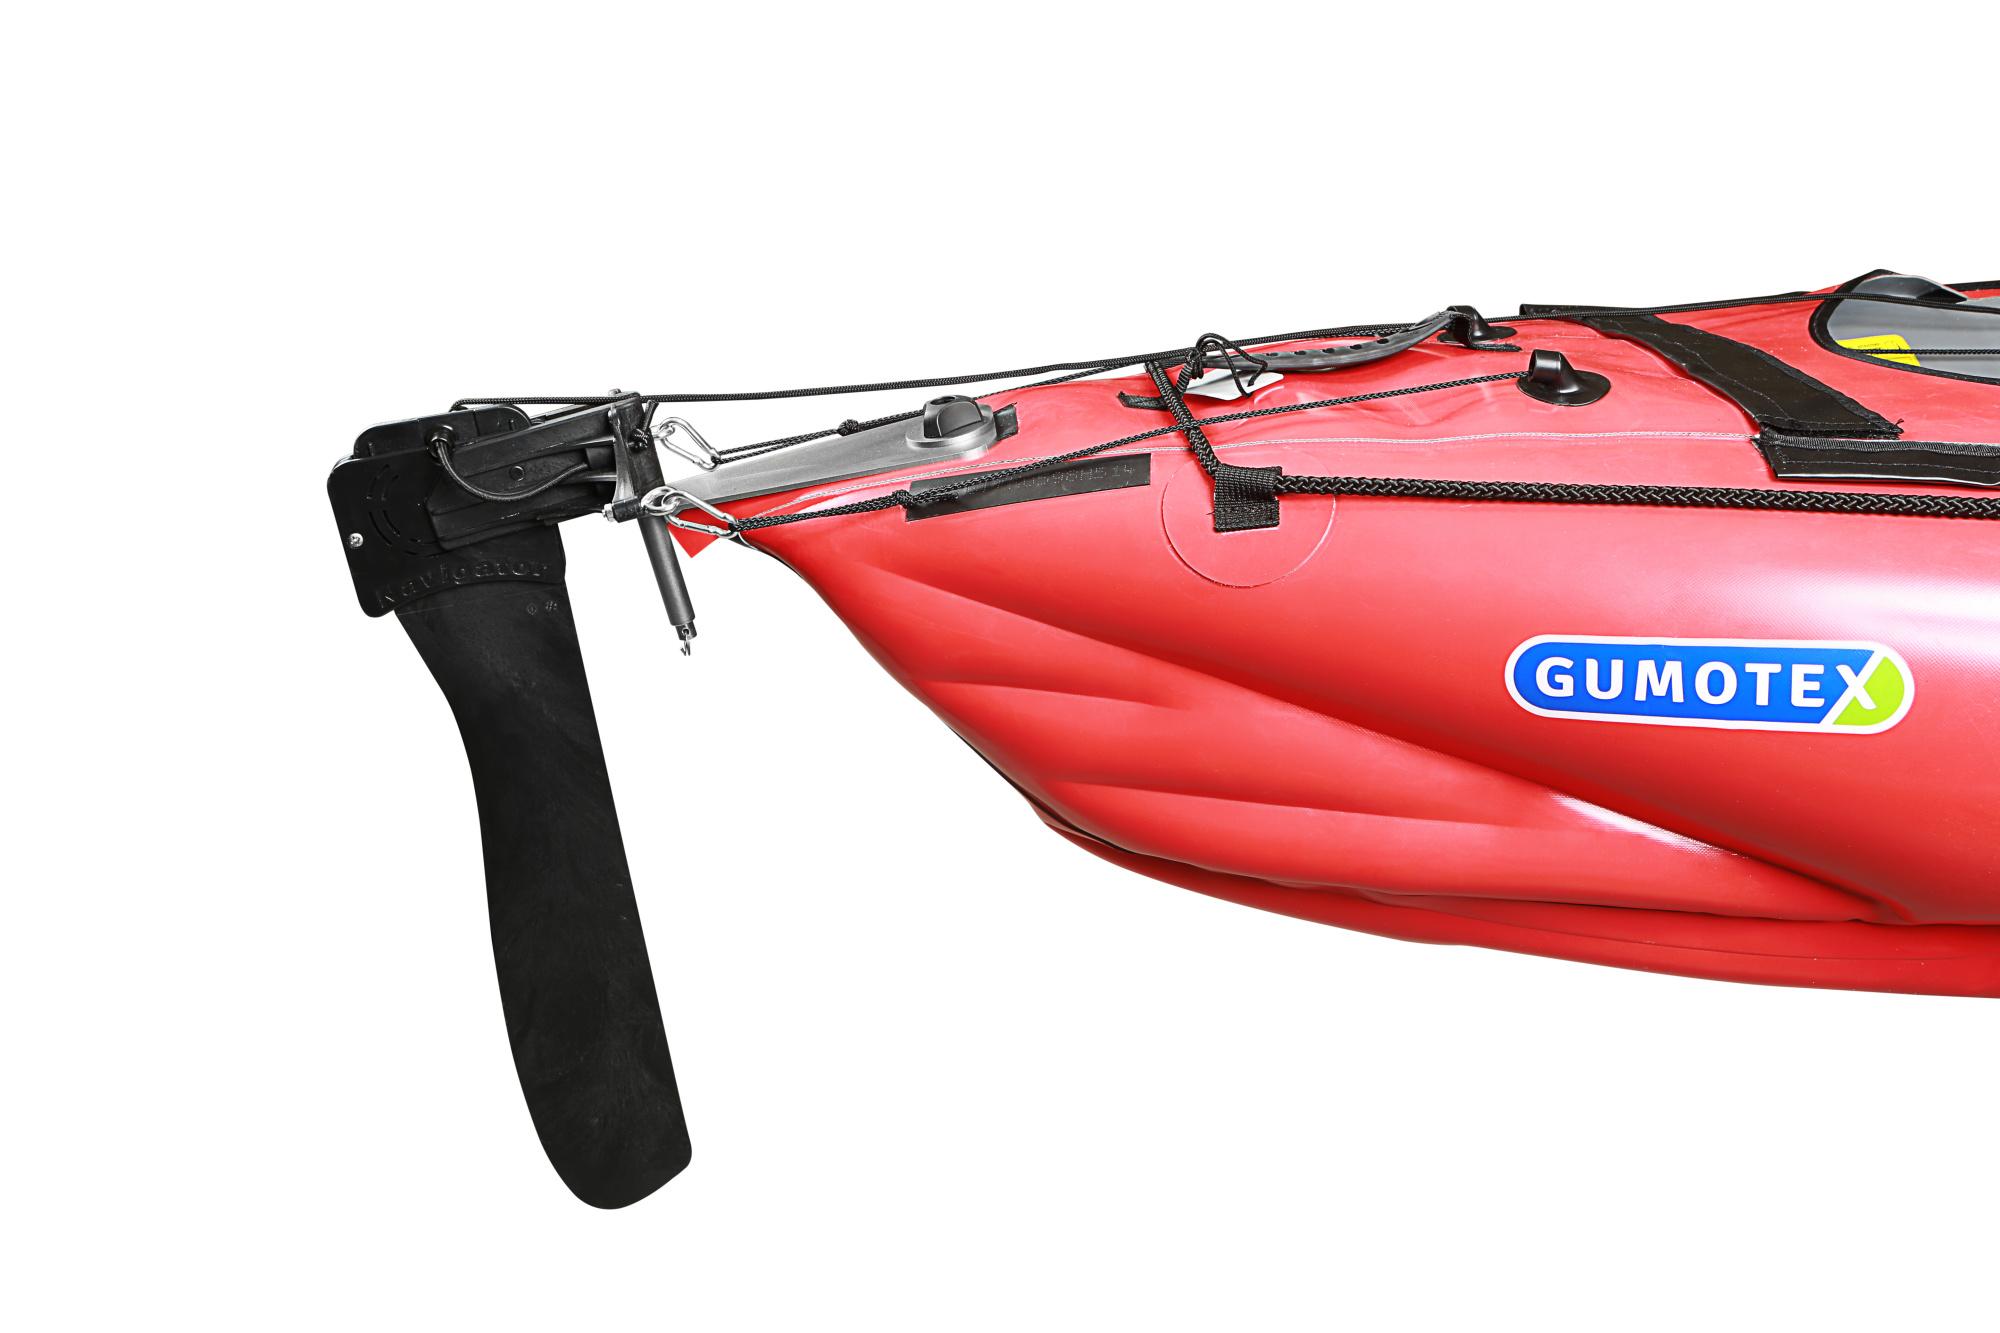 Kajak Gumotex Seawave + 2 pádla + pumpa + kormidlo + zár.3 roky